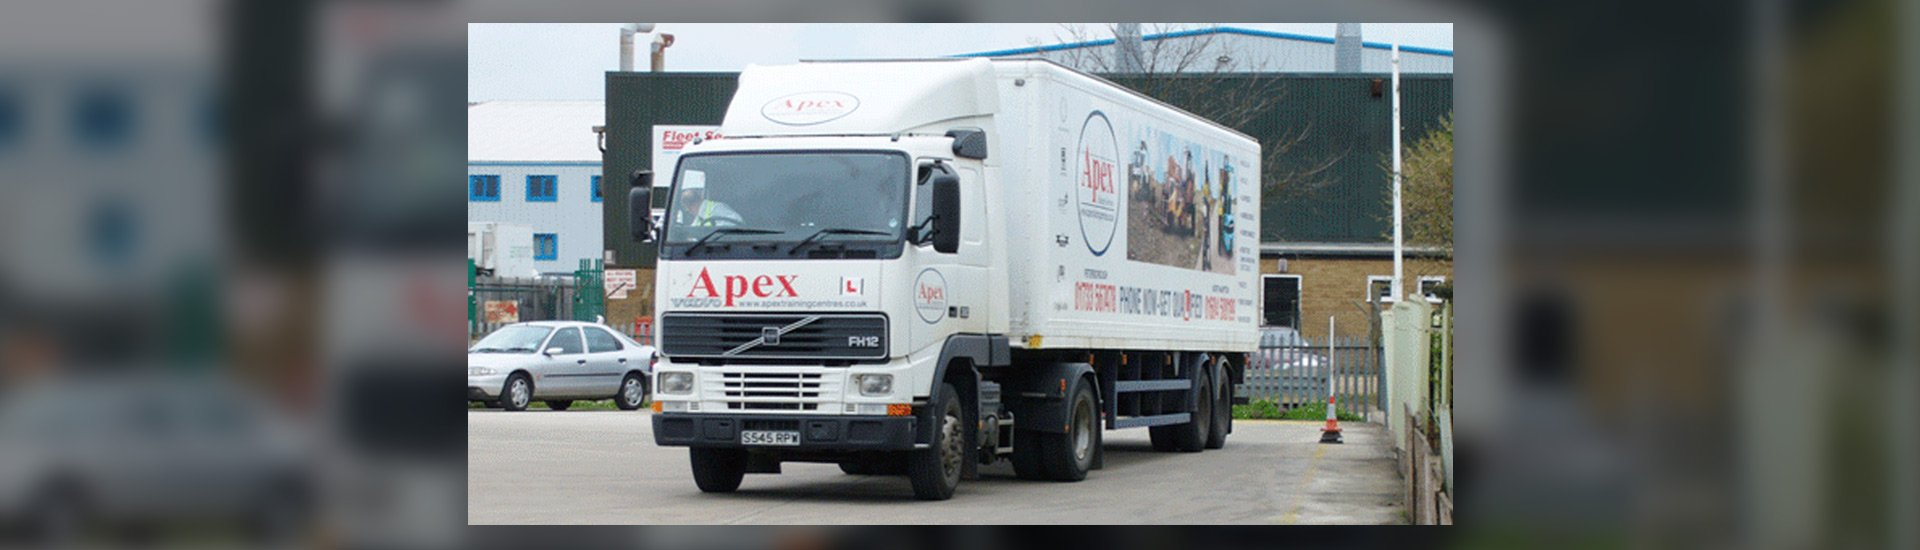 Apex vehicle